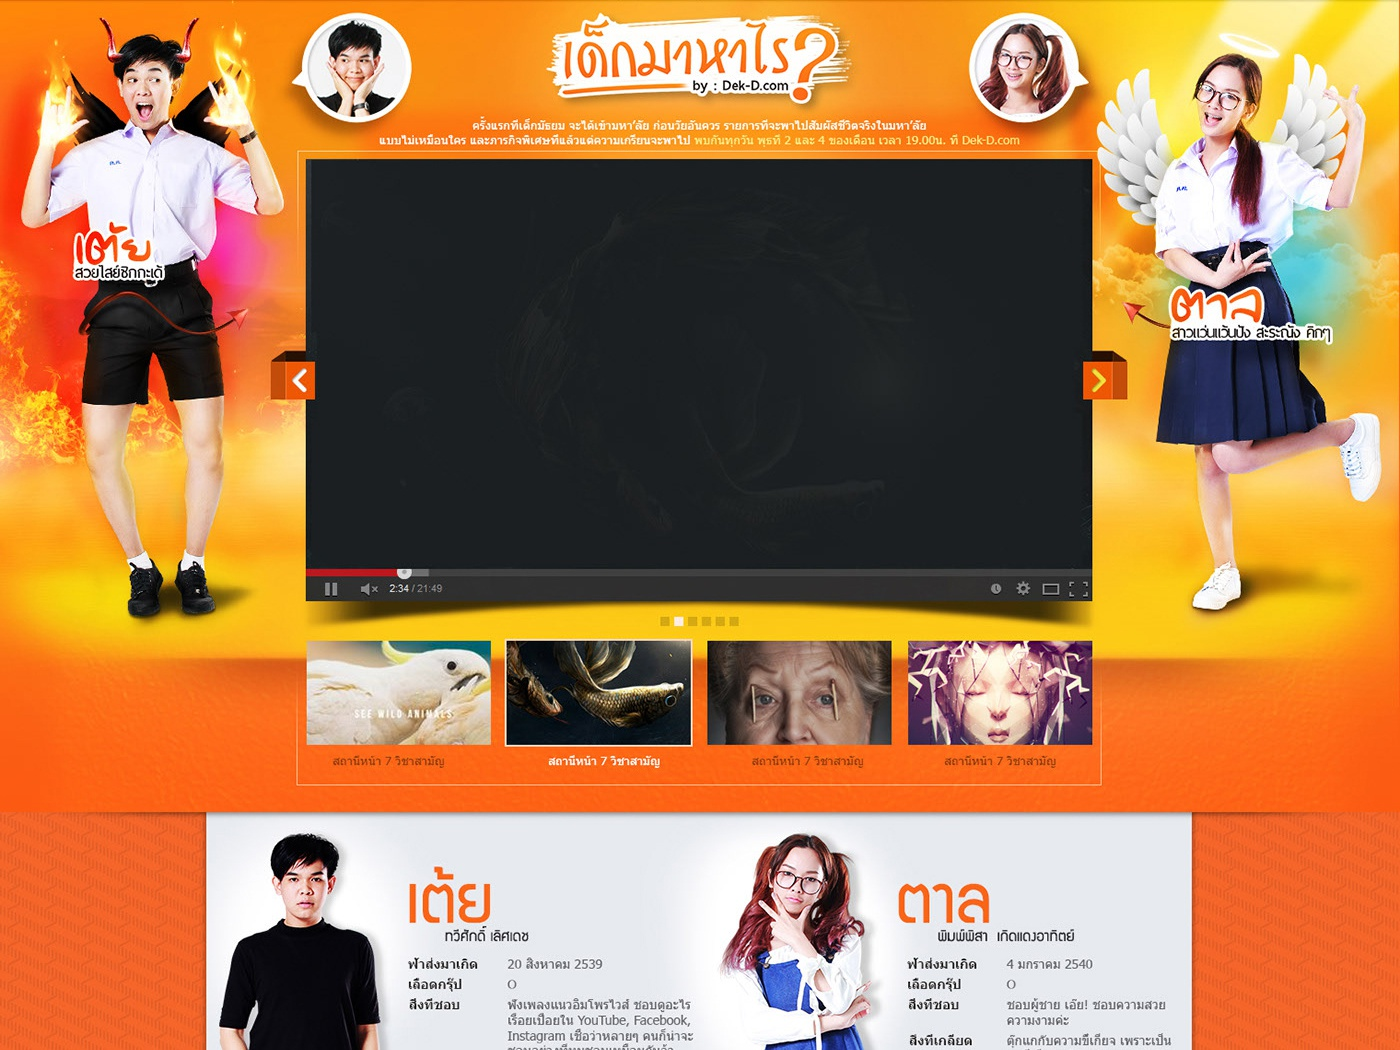 dekmaharai 2 graphic designer designer creative direction art web design ui ux retouching mobile